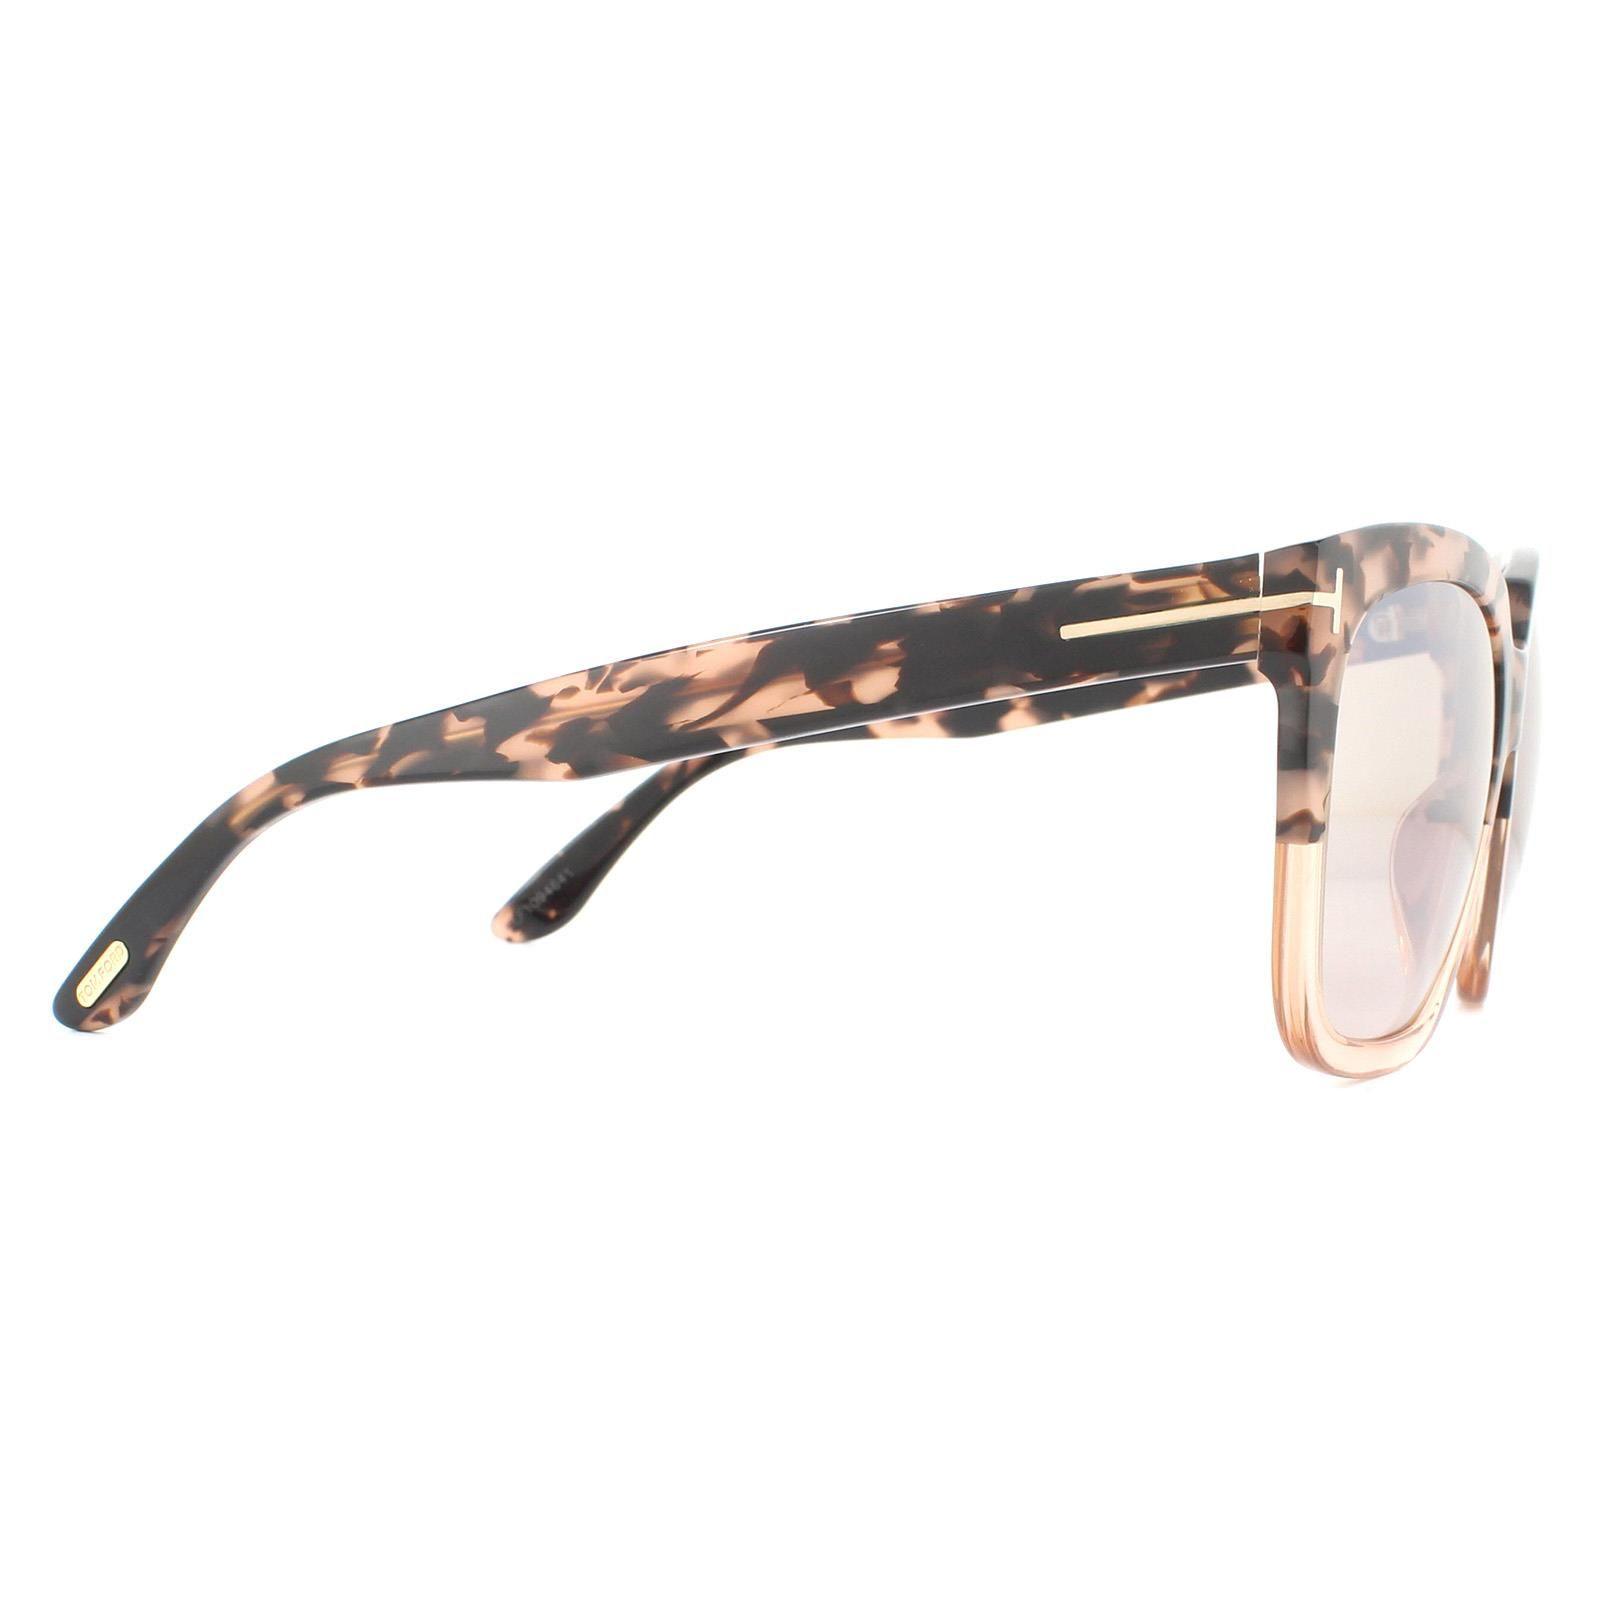 Tom Ford Sunglasses Amarra FT0502 55G Pink Havana Brown Mirror